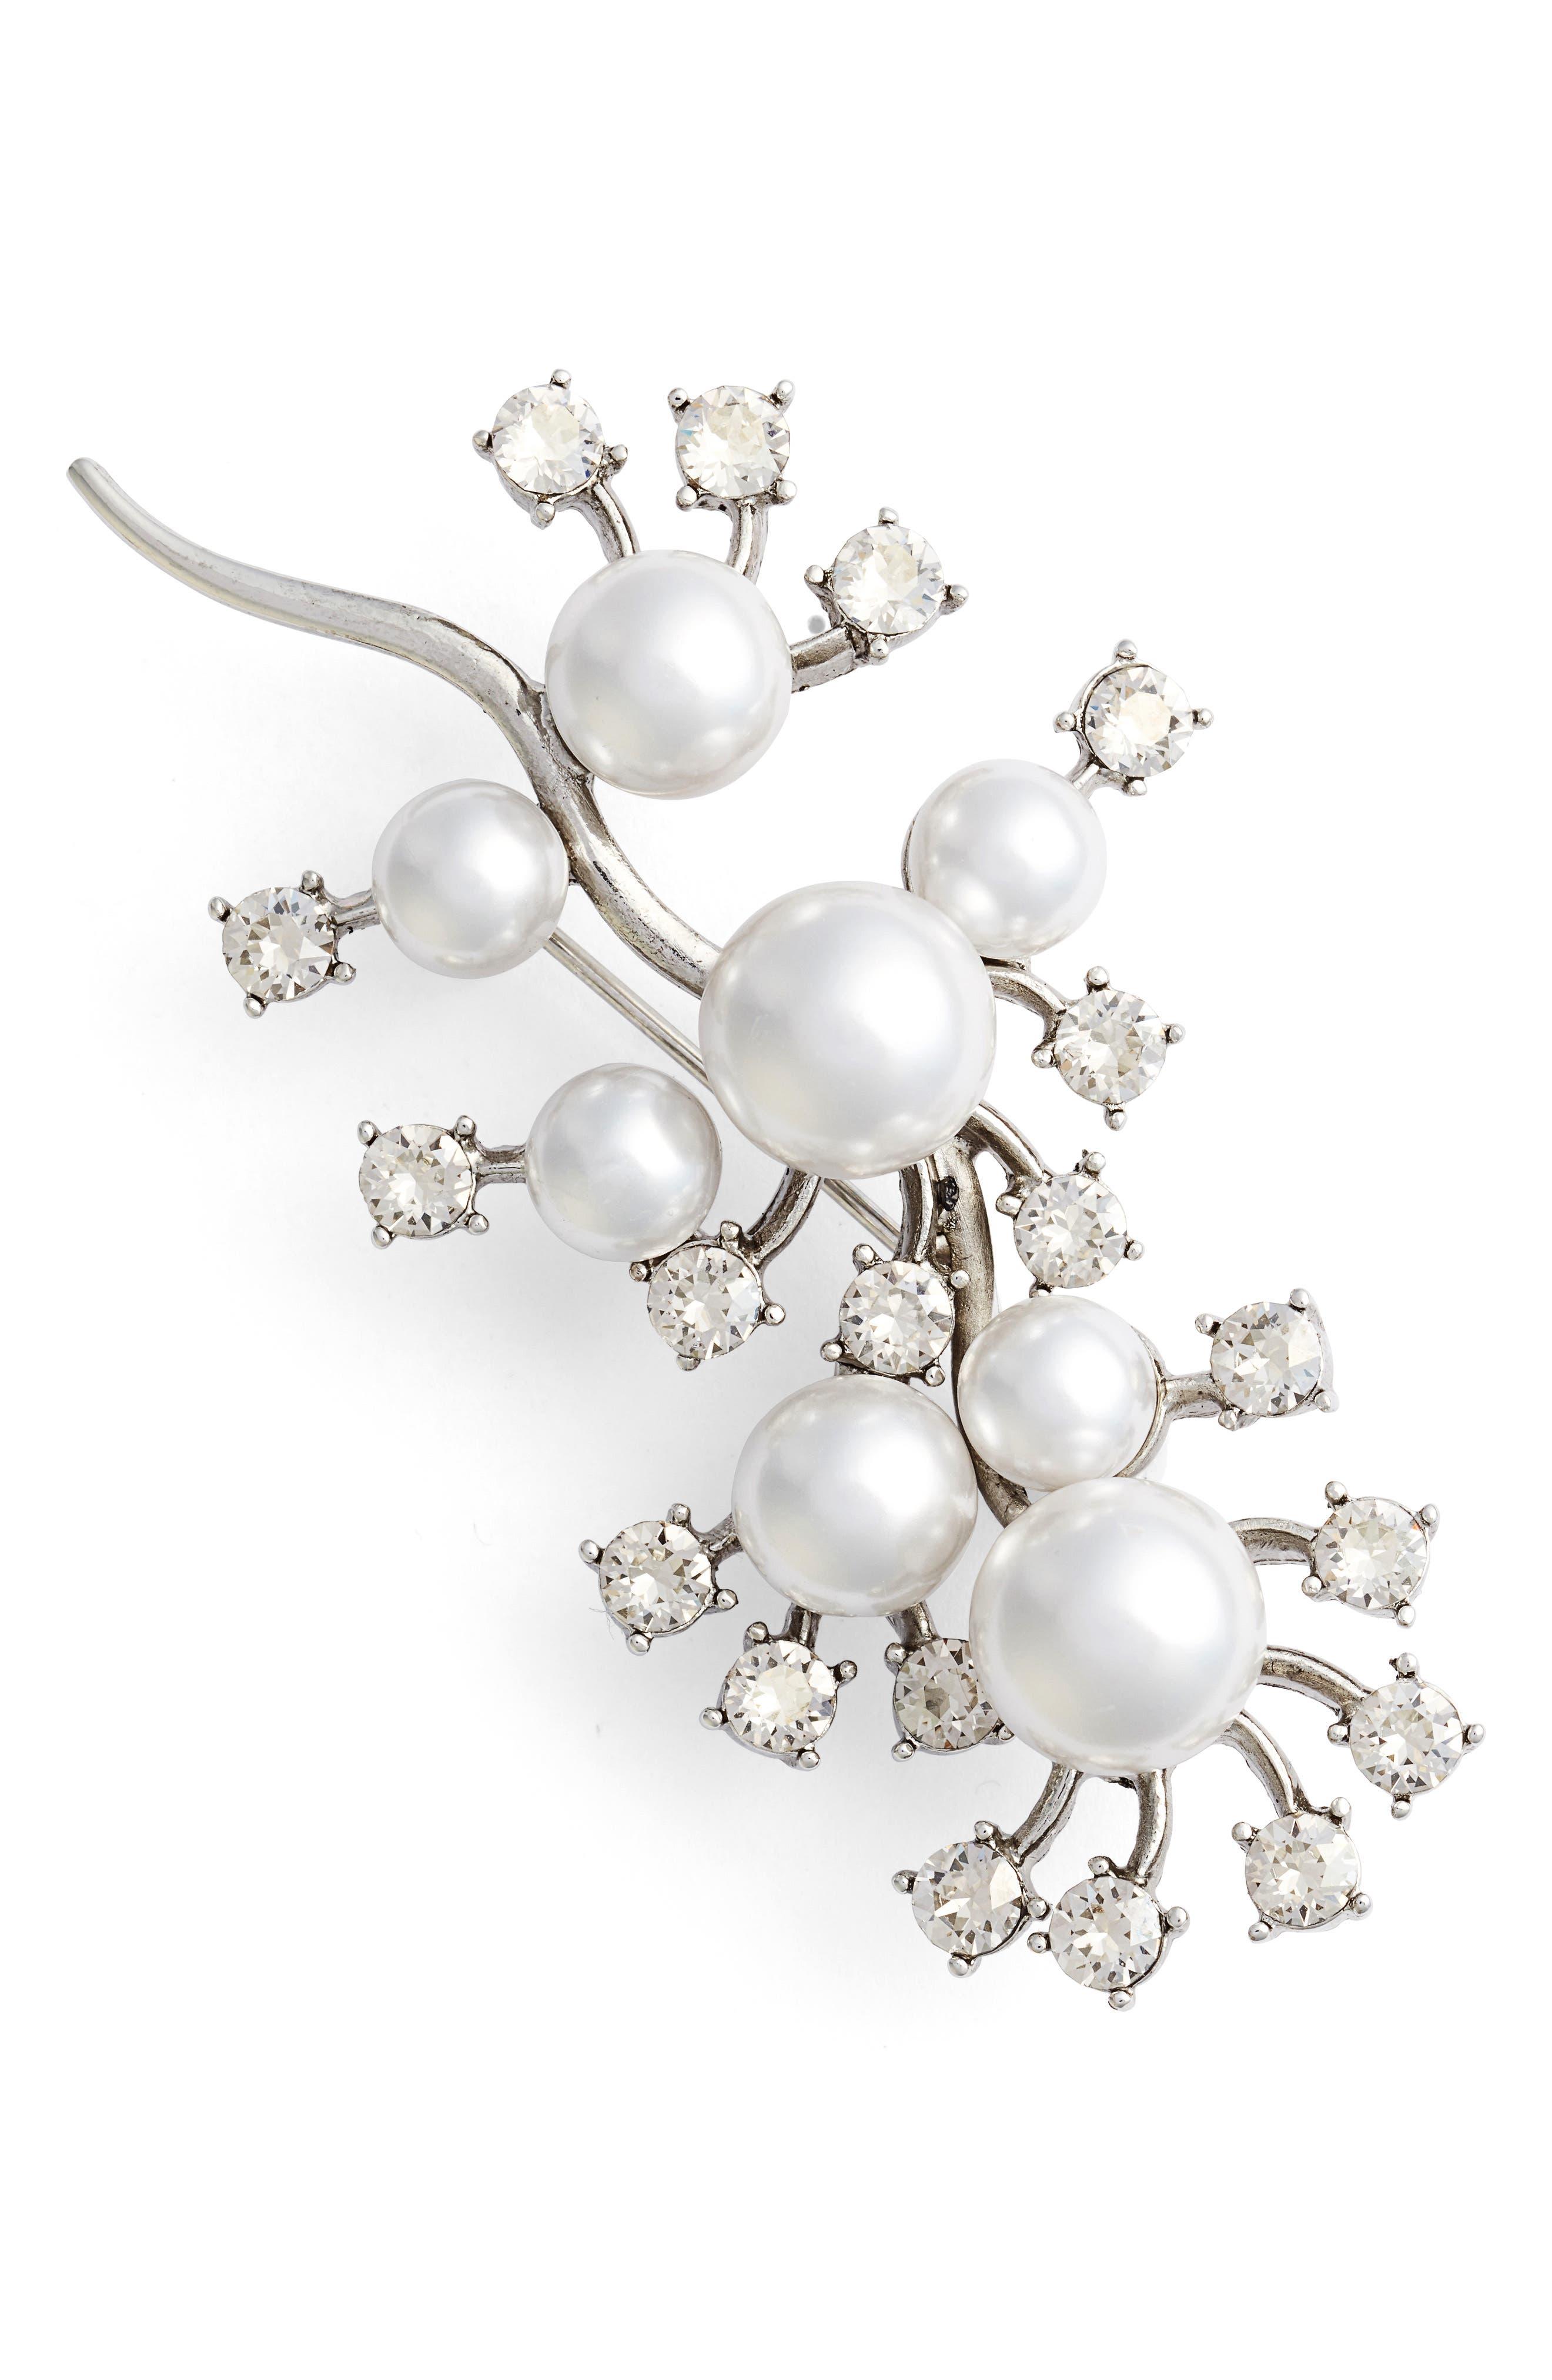 Scattered Imitation Pearl & Crystal Brooch,                             Main thumbnail 1, color,                             040